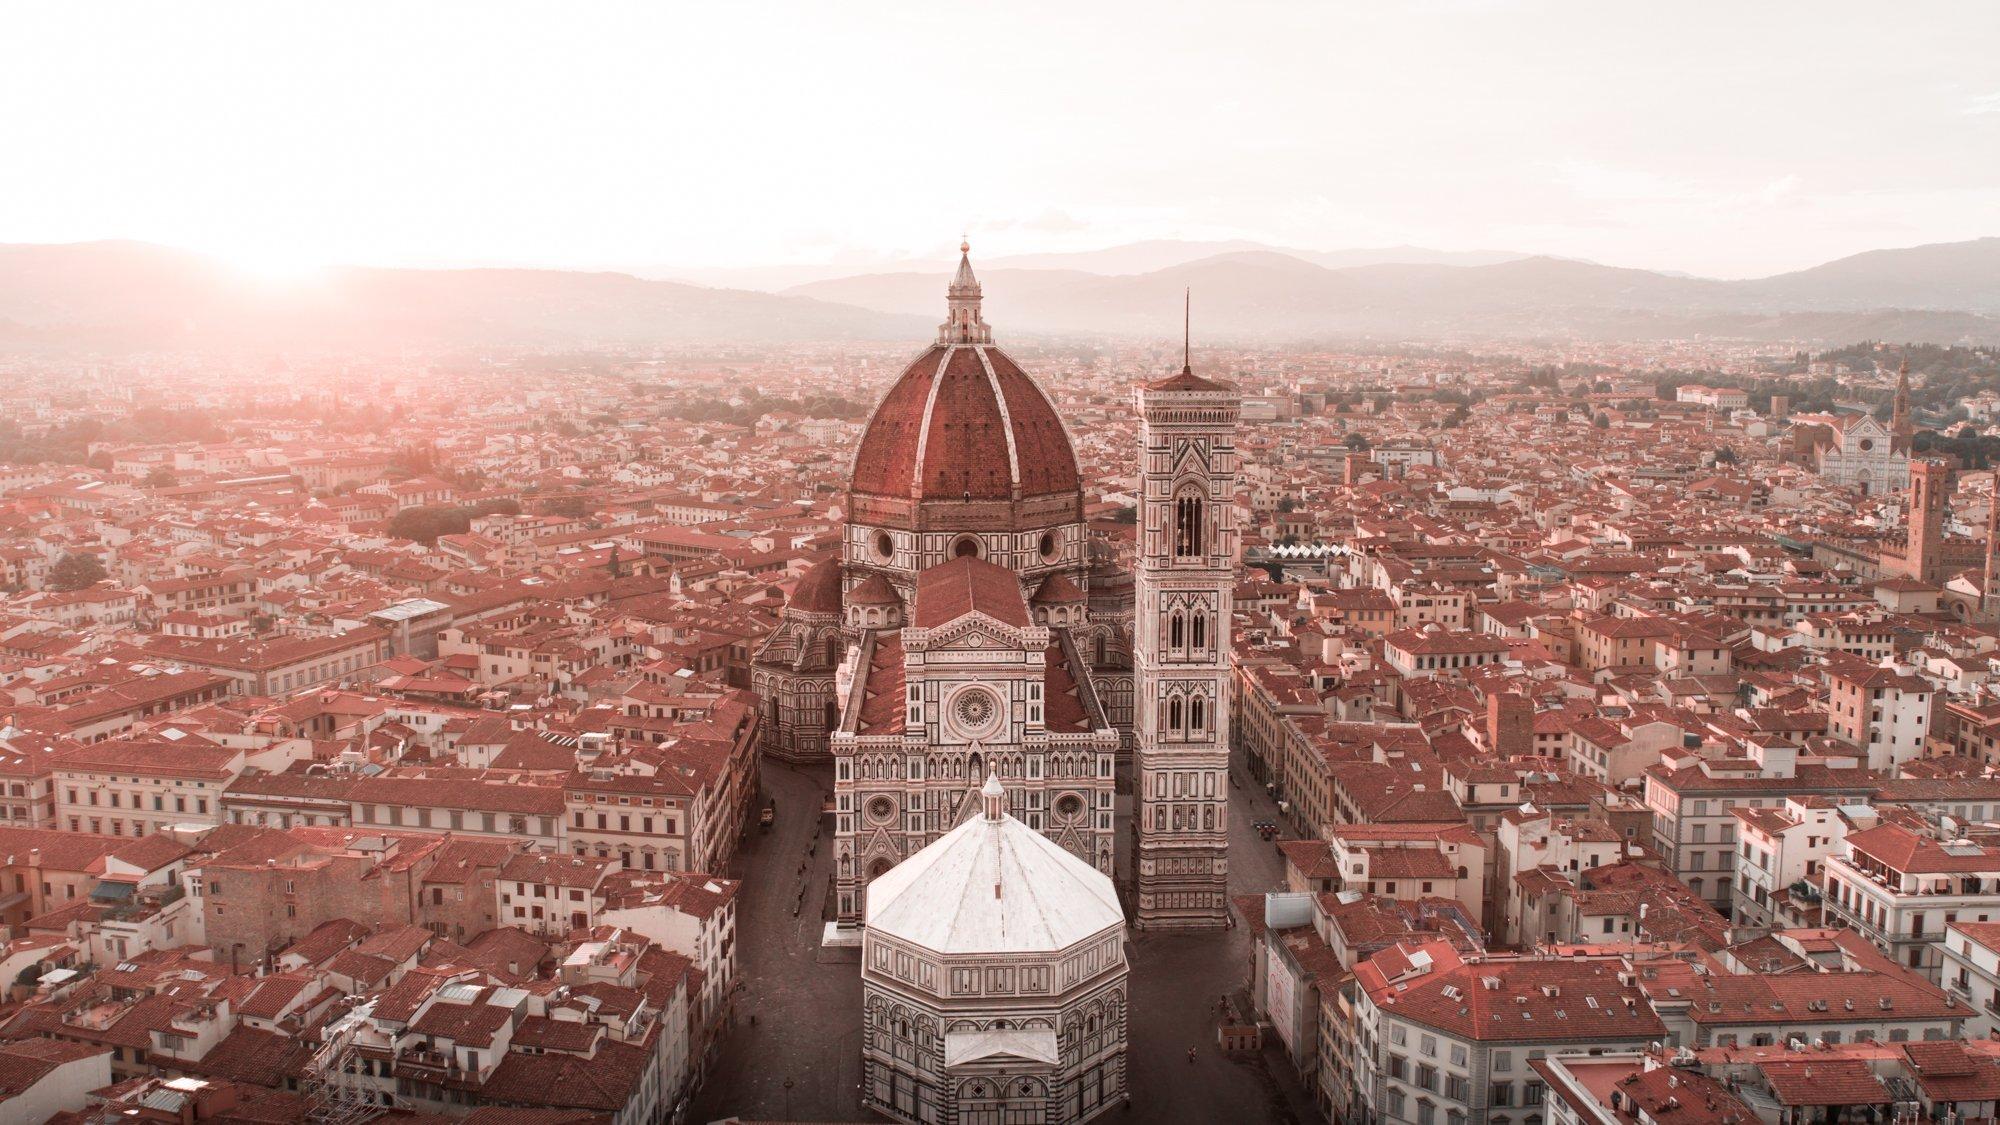 Florence Dome: Florence Dome